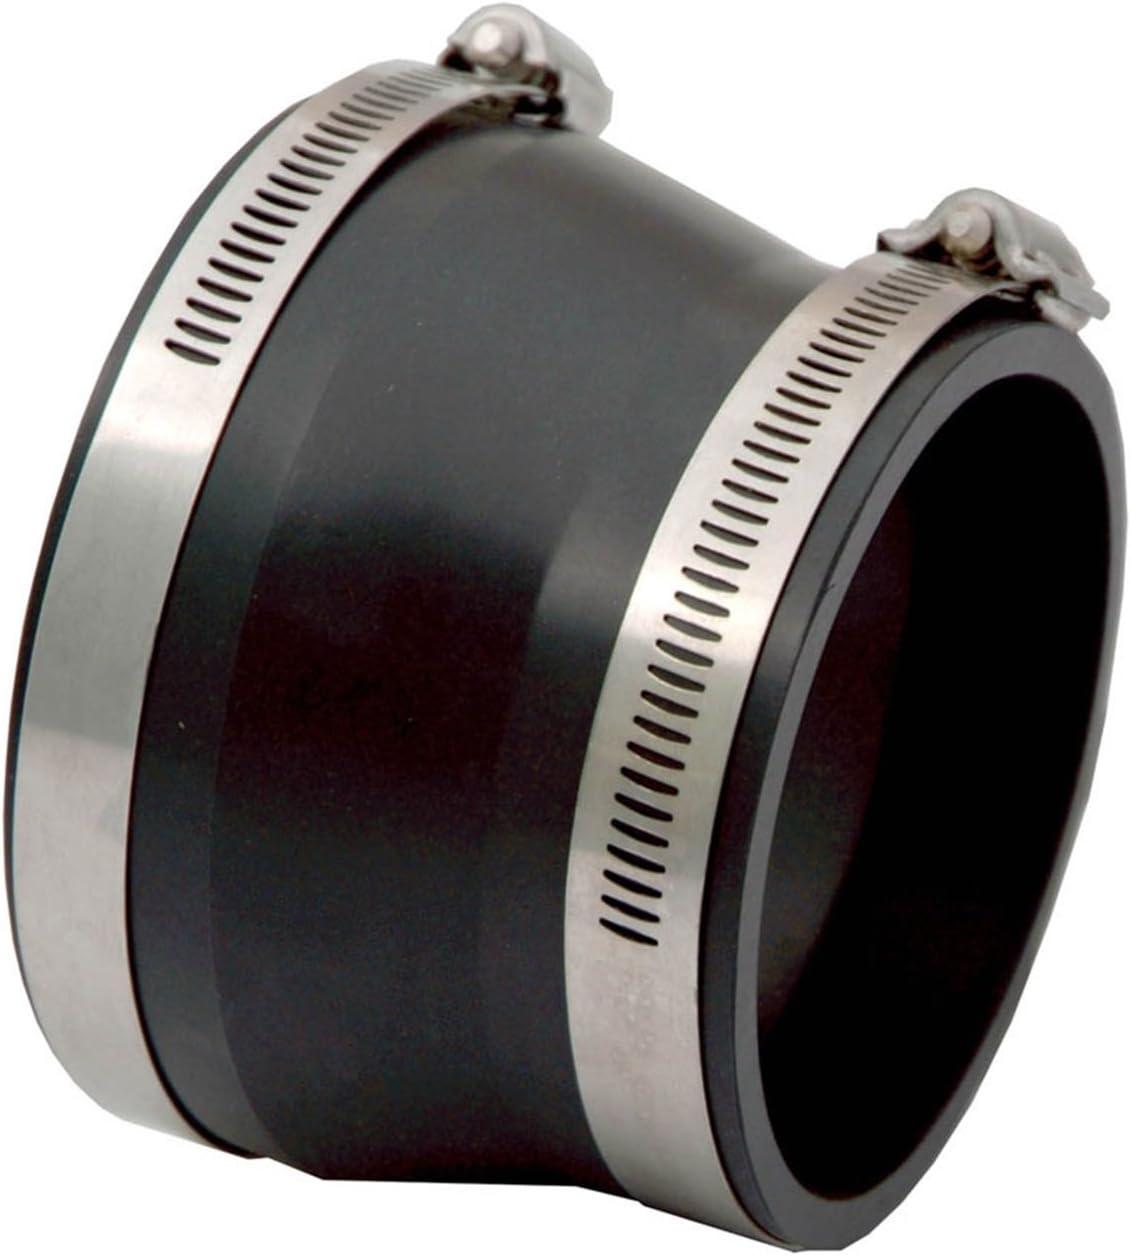 Spectre Industries 9571 Air Intake Hose Coupler